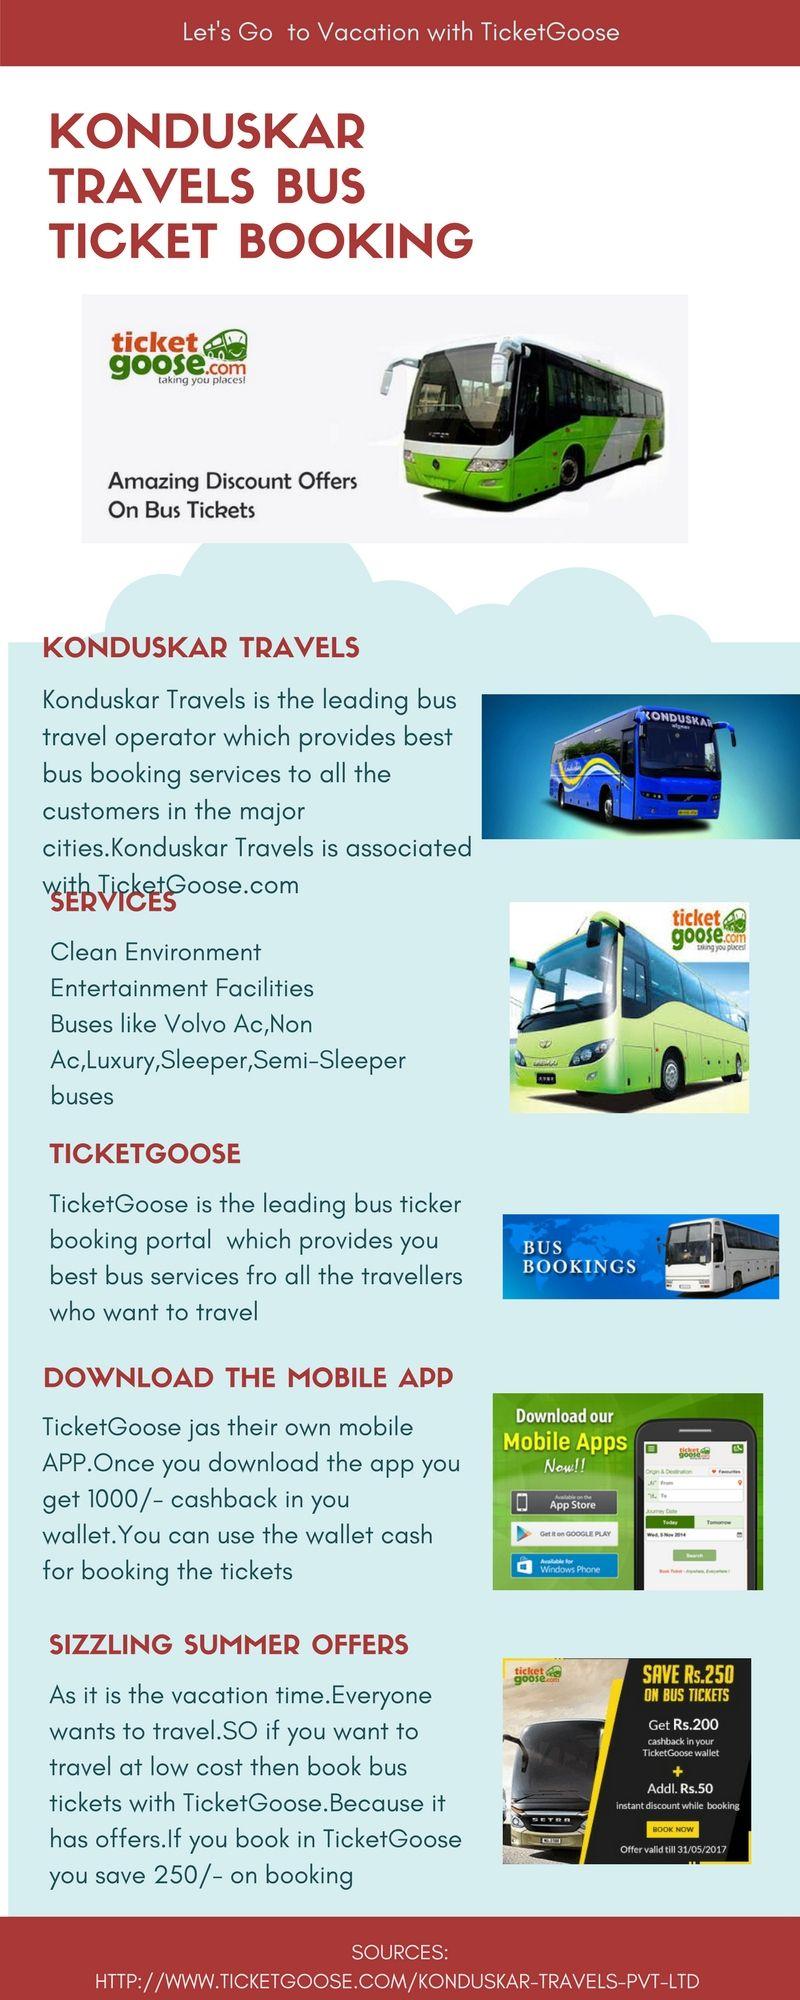 Konduskar Travels Provides Bus Services To Mumbai Kohlapur Pune